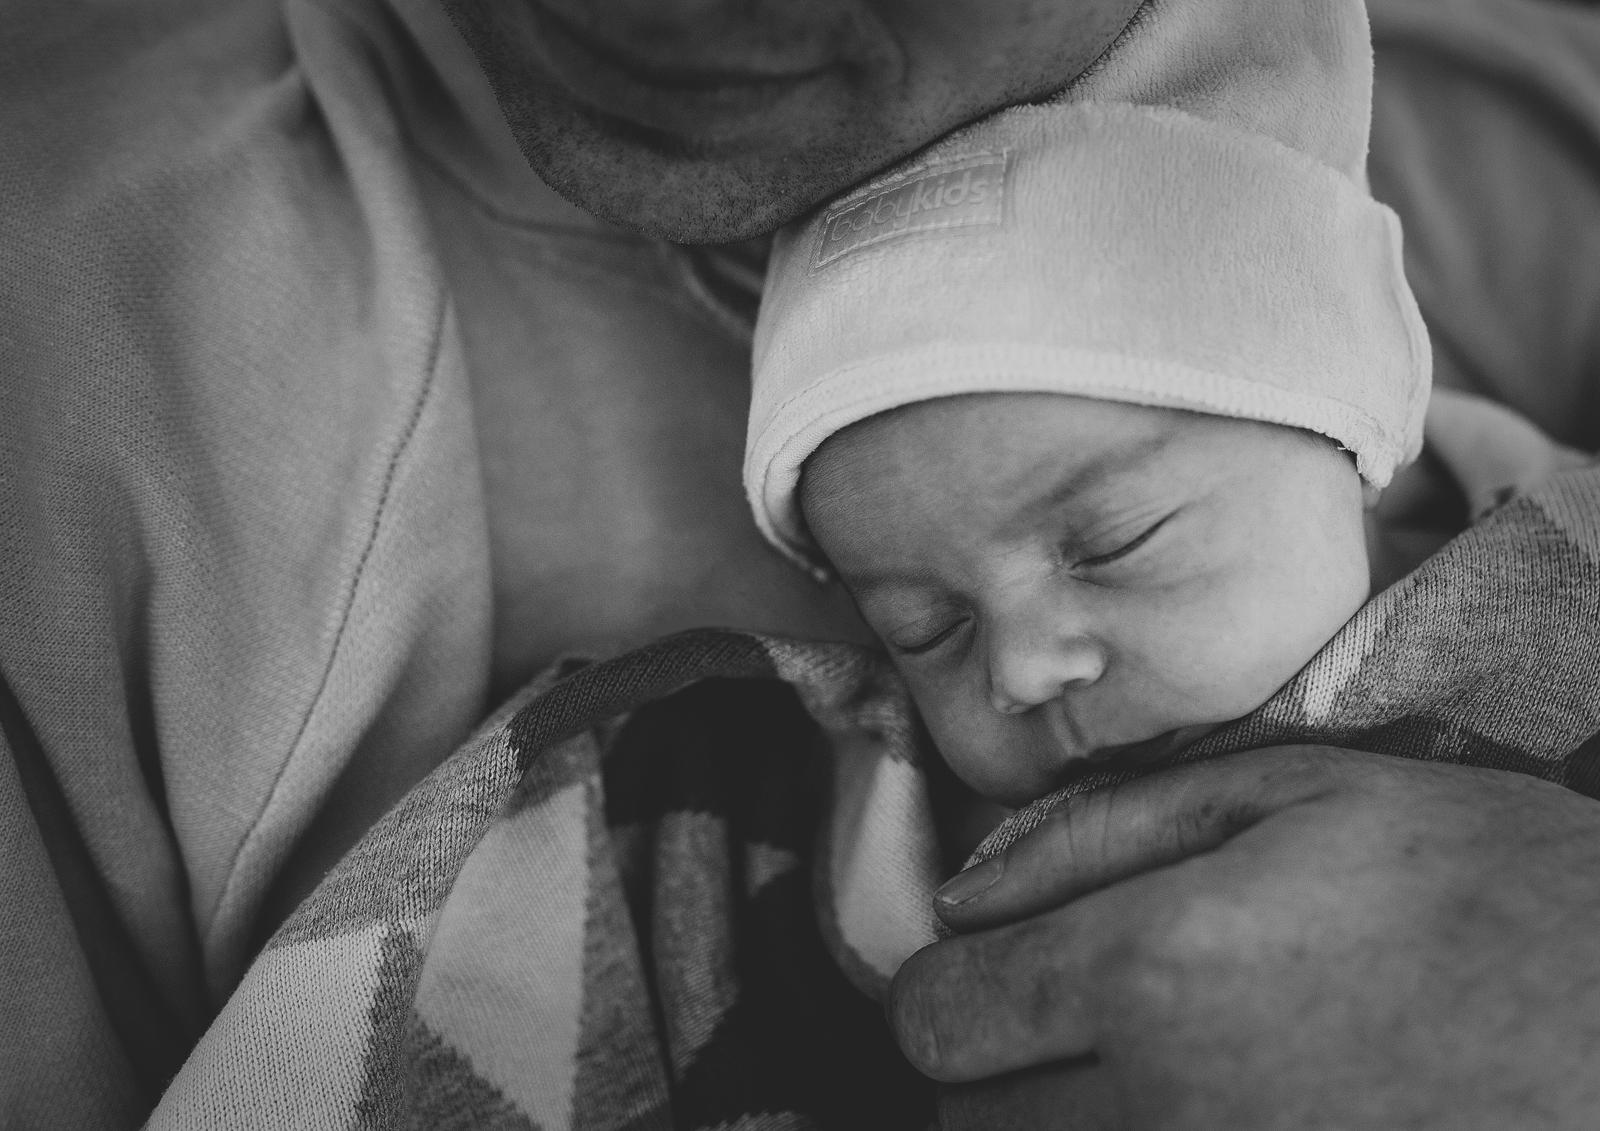 Cuddles for newborn baby girl